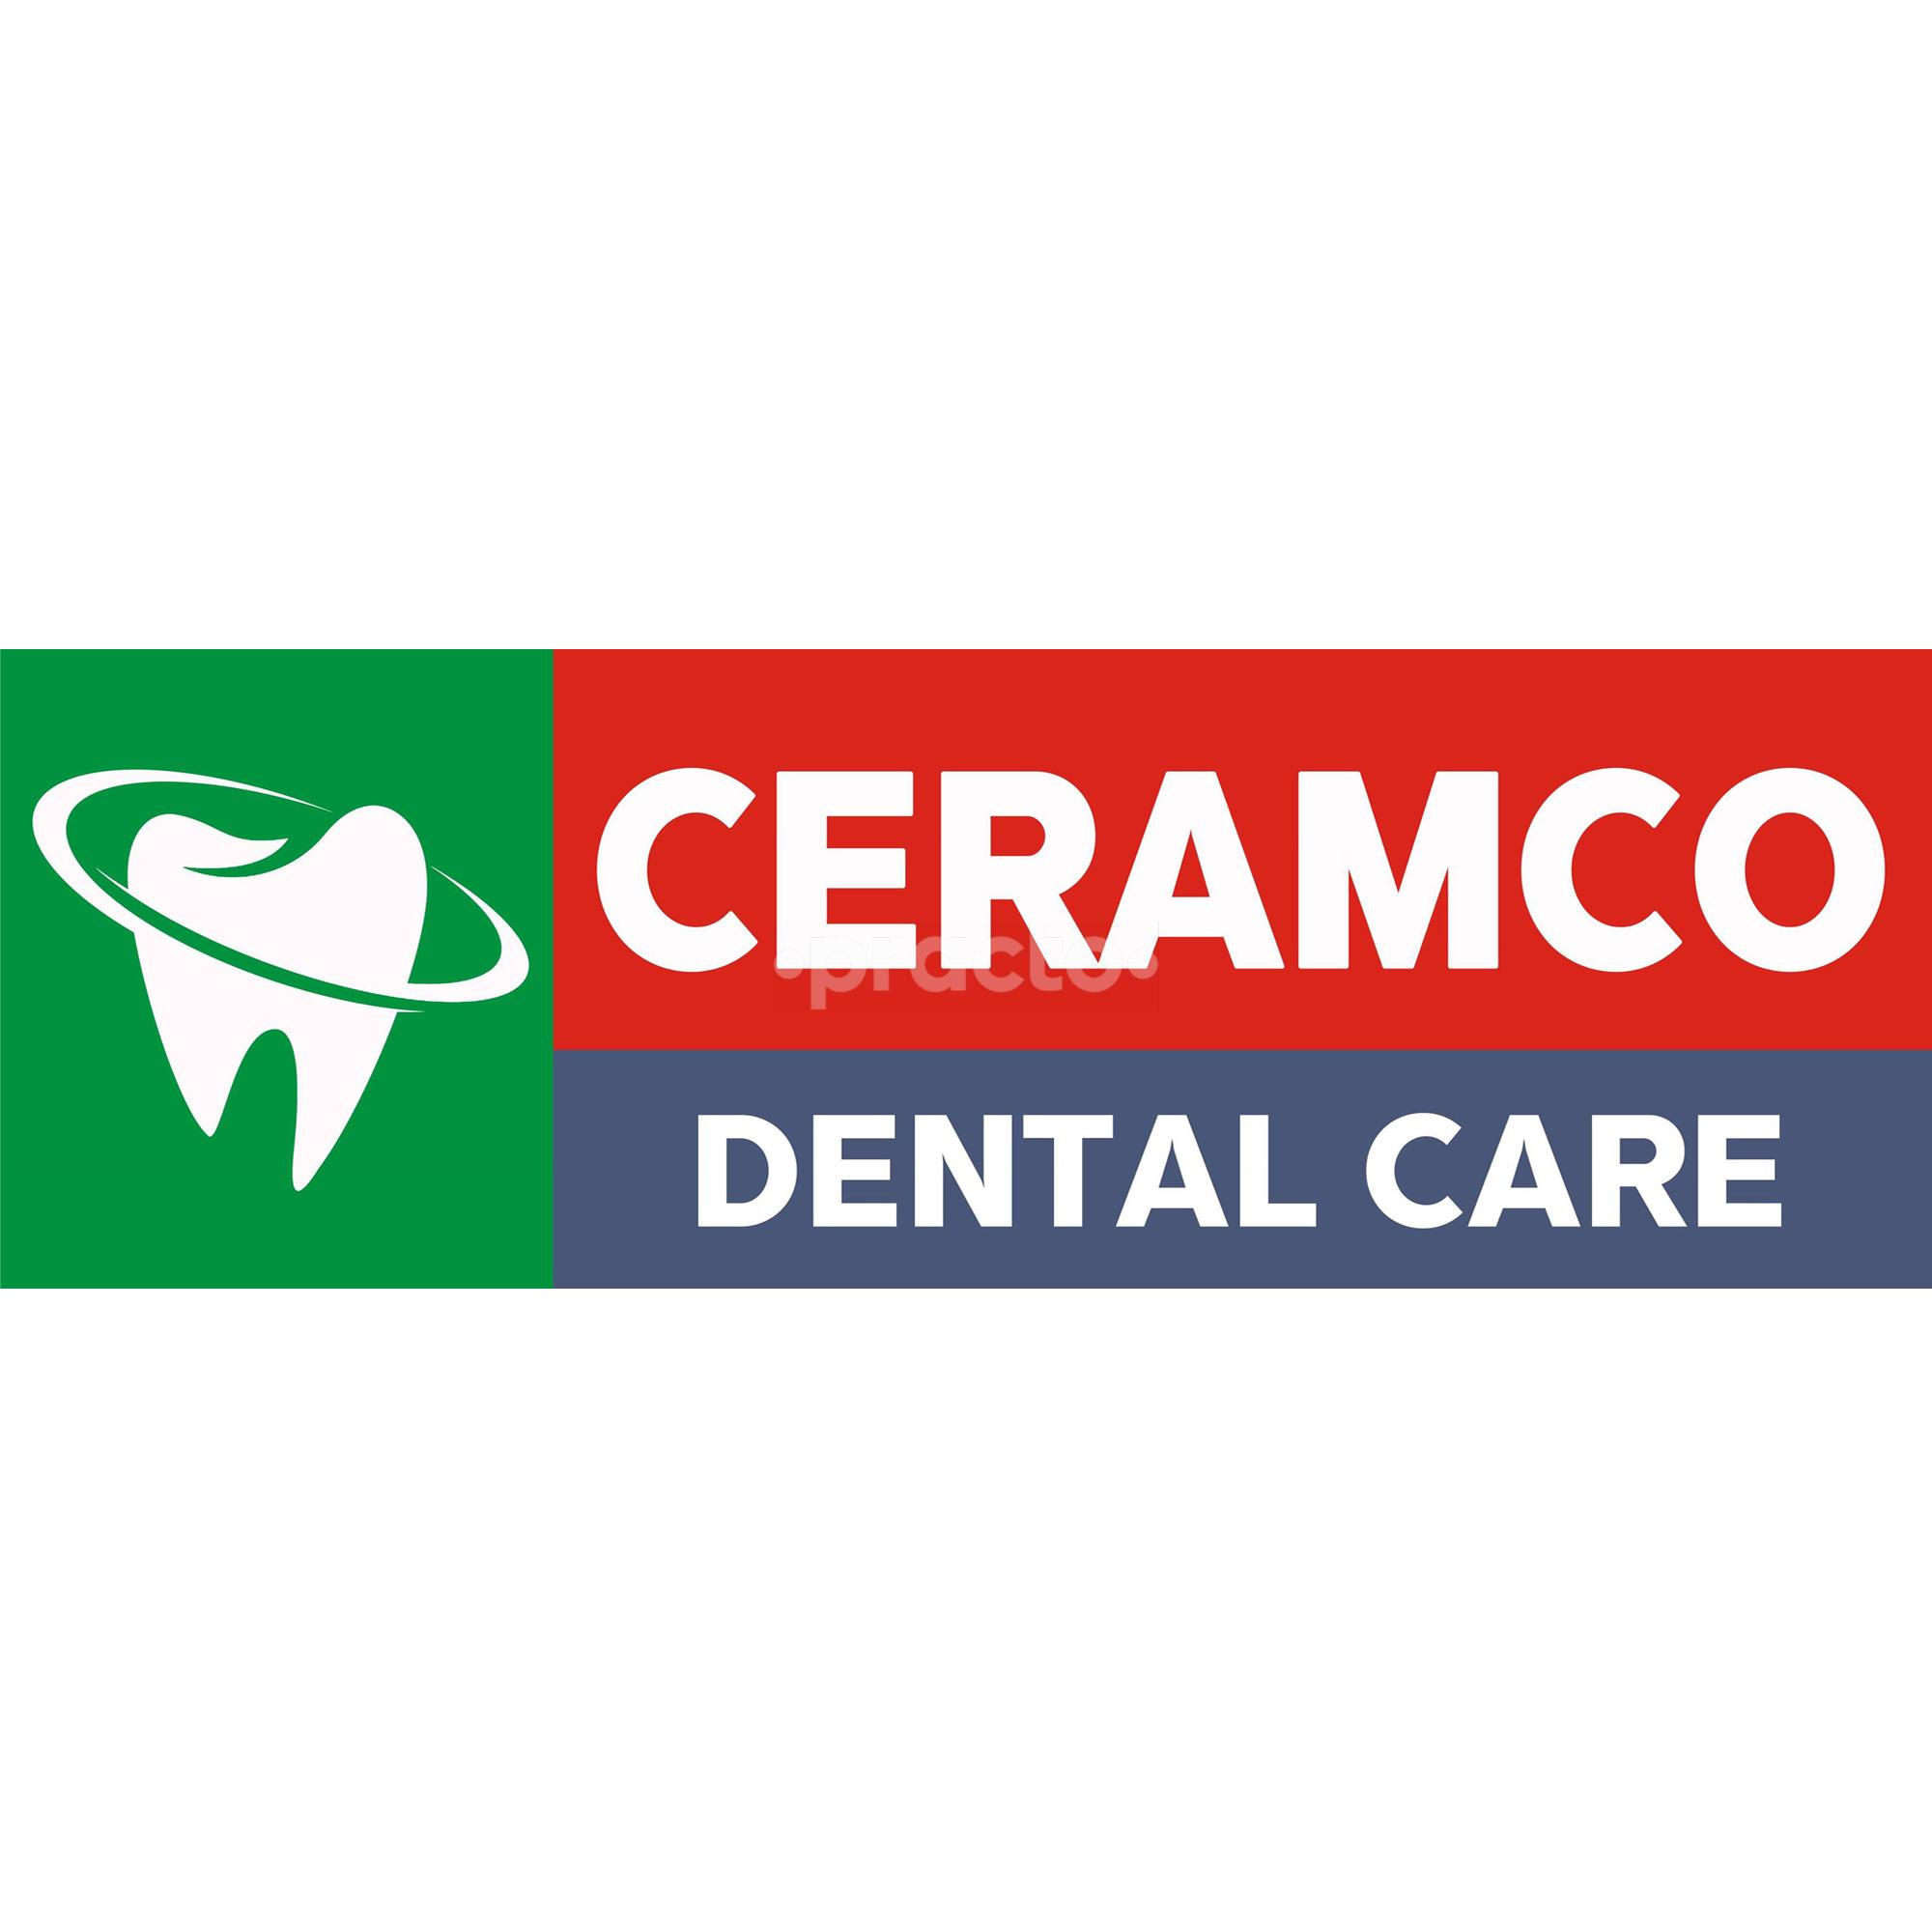 Ceramco Dental Care